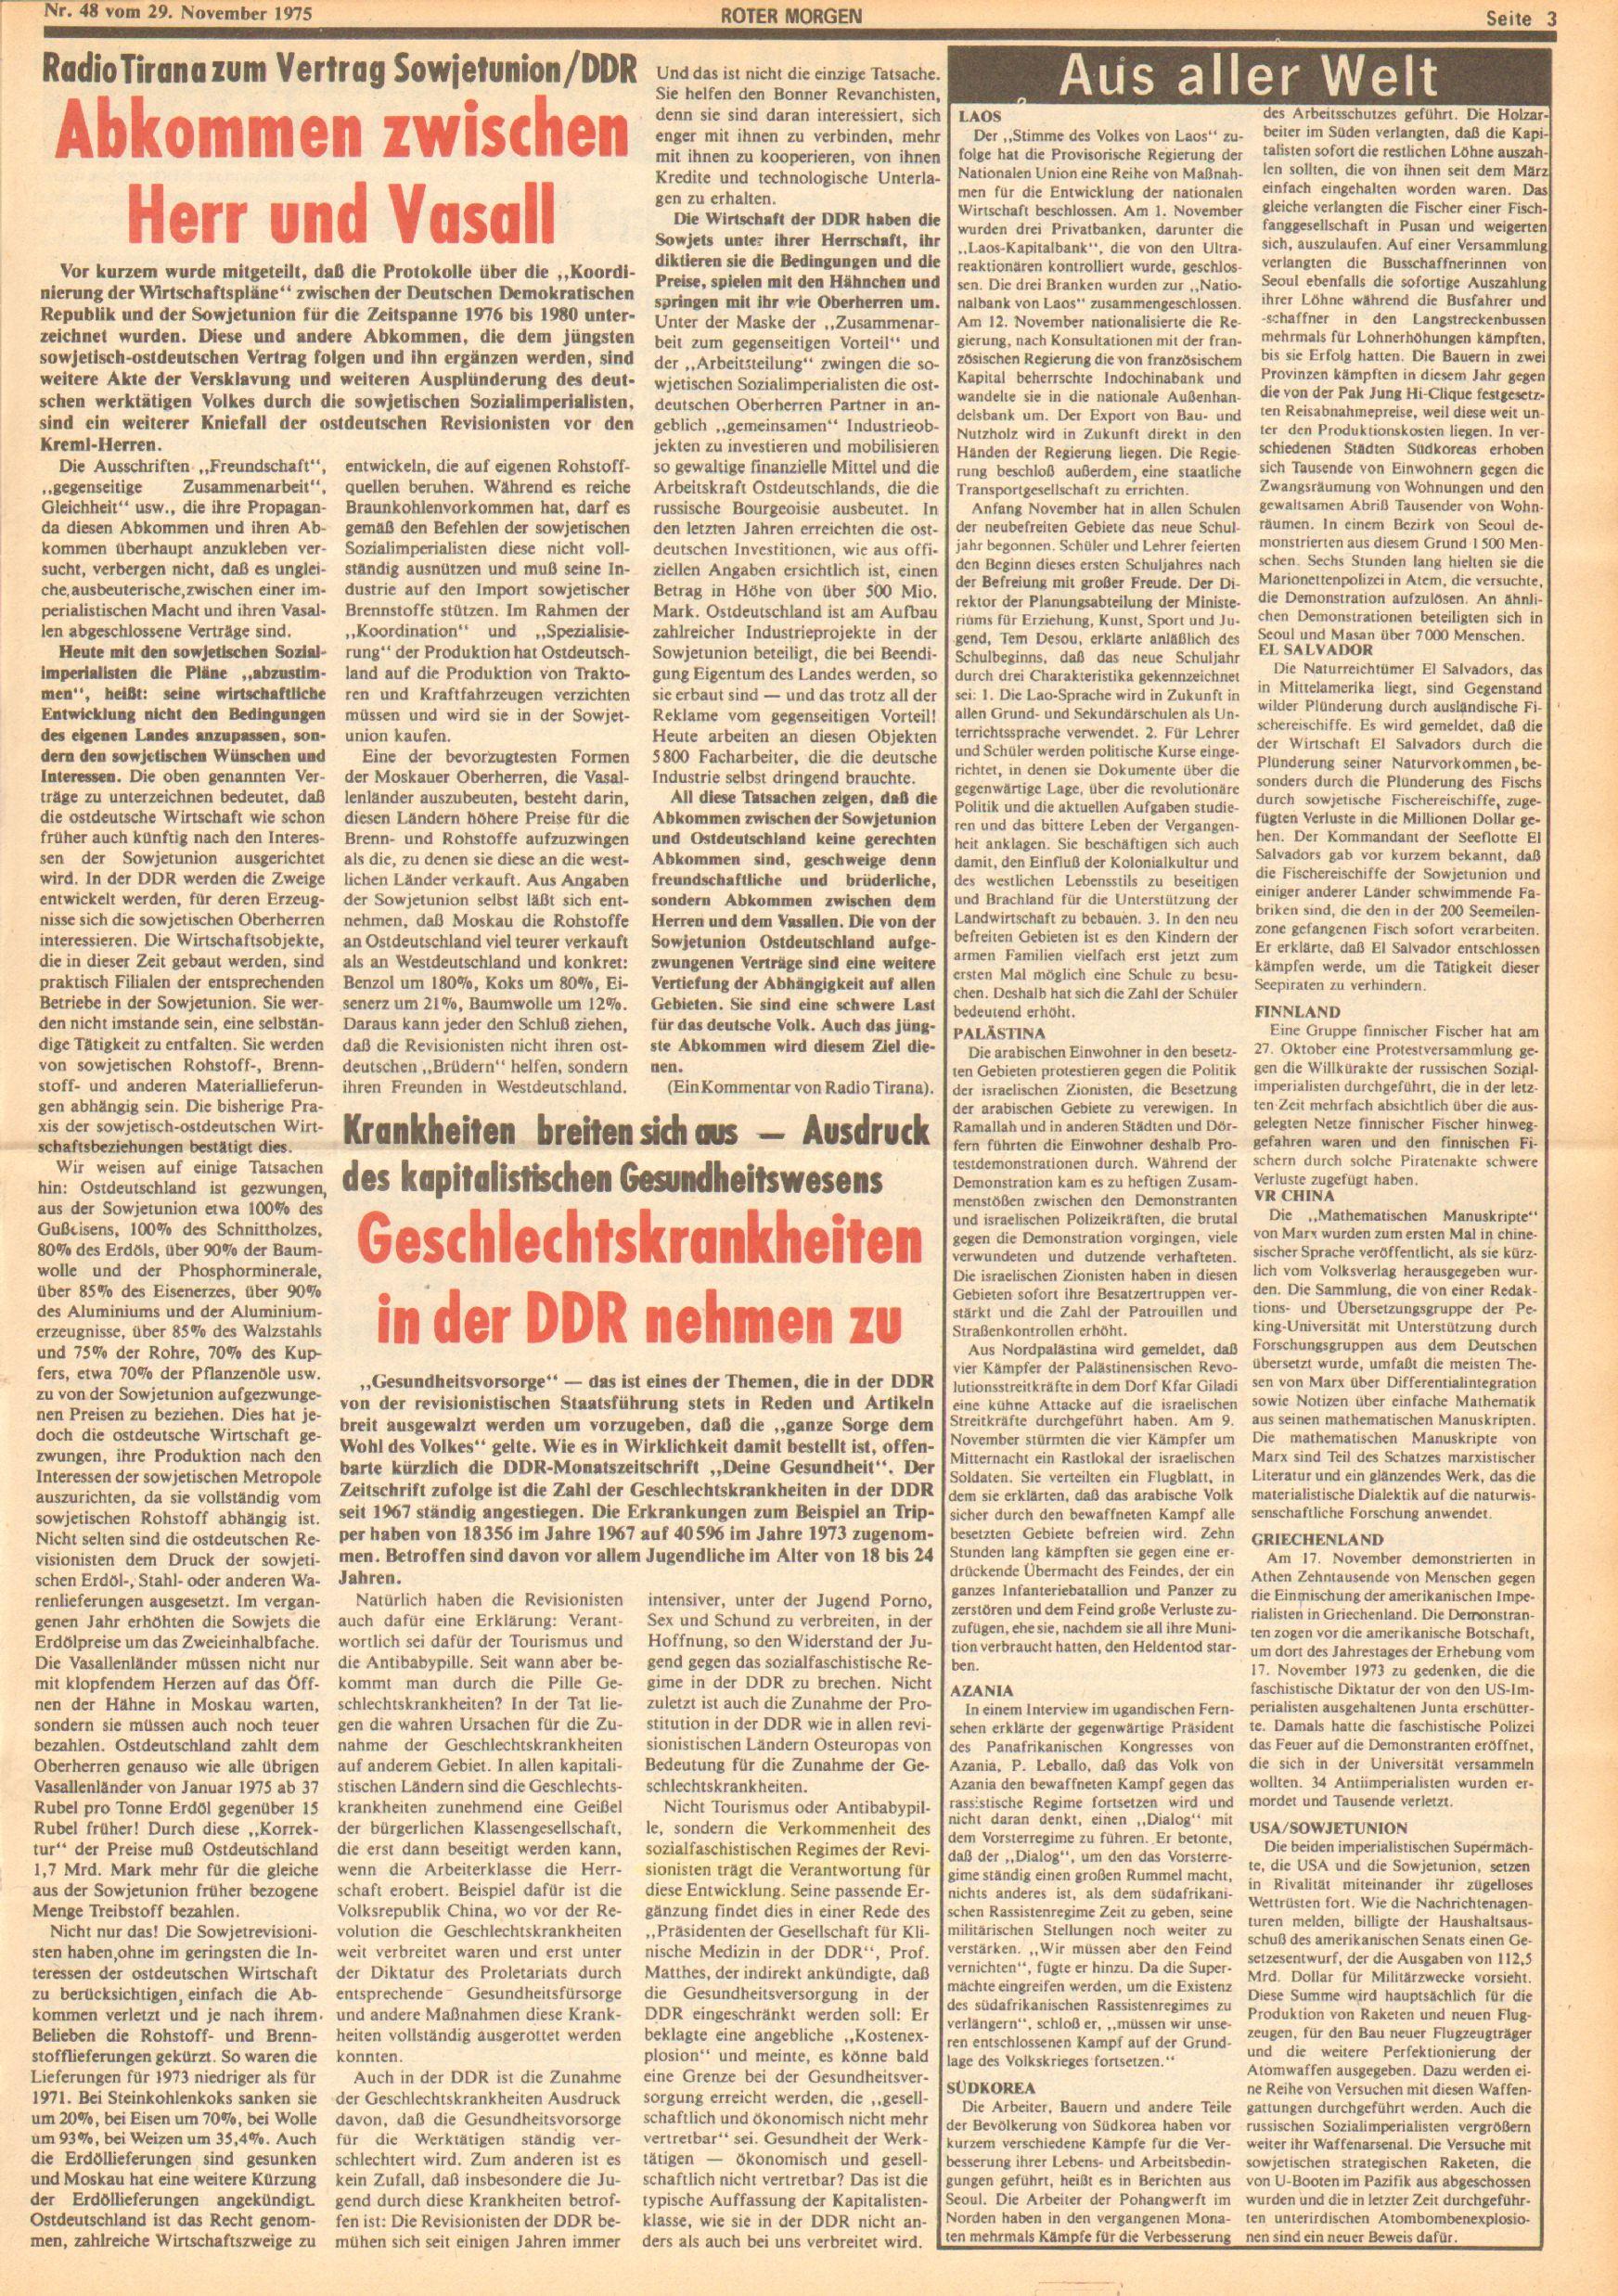 Roter Morgen, 9. Jg., 29. November 1975, Nr. 48, Seite 3